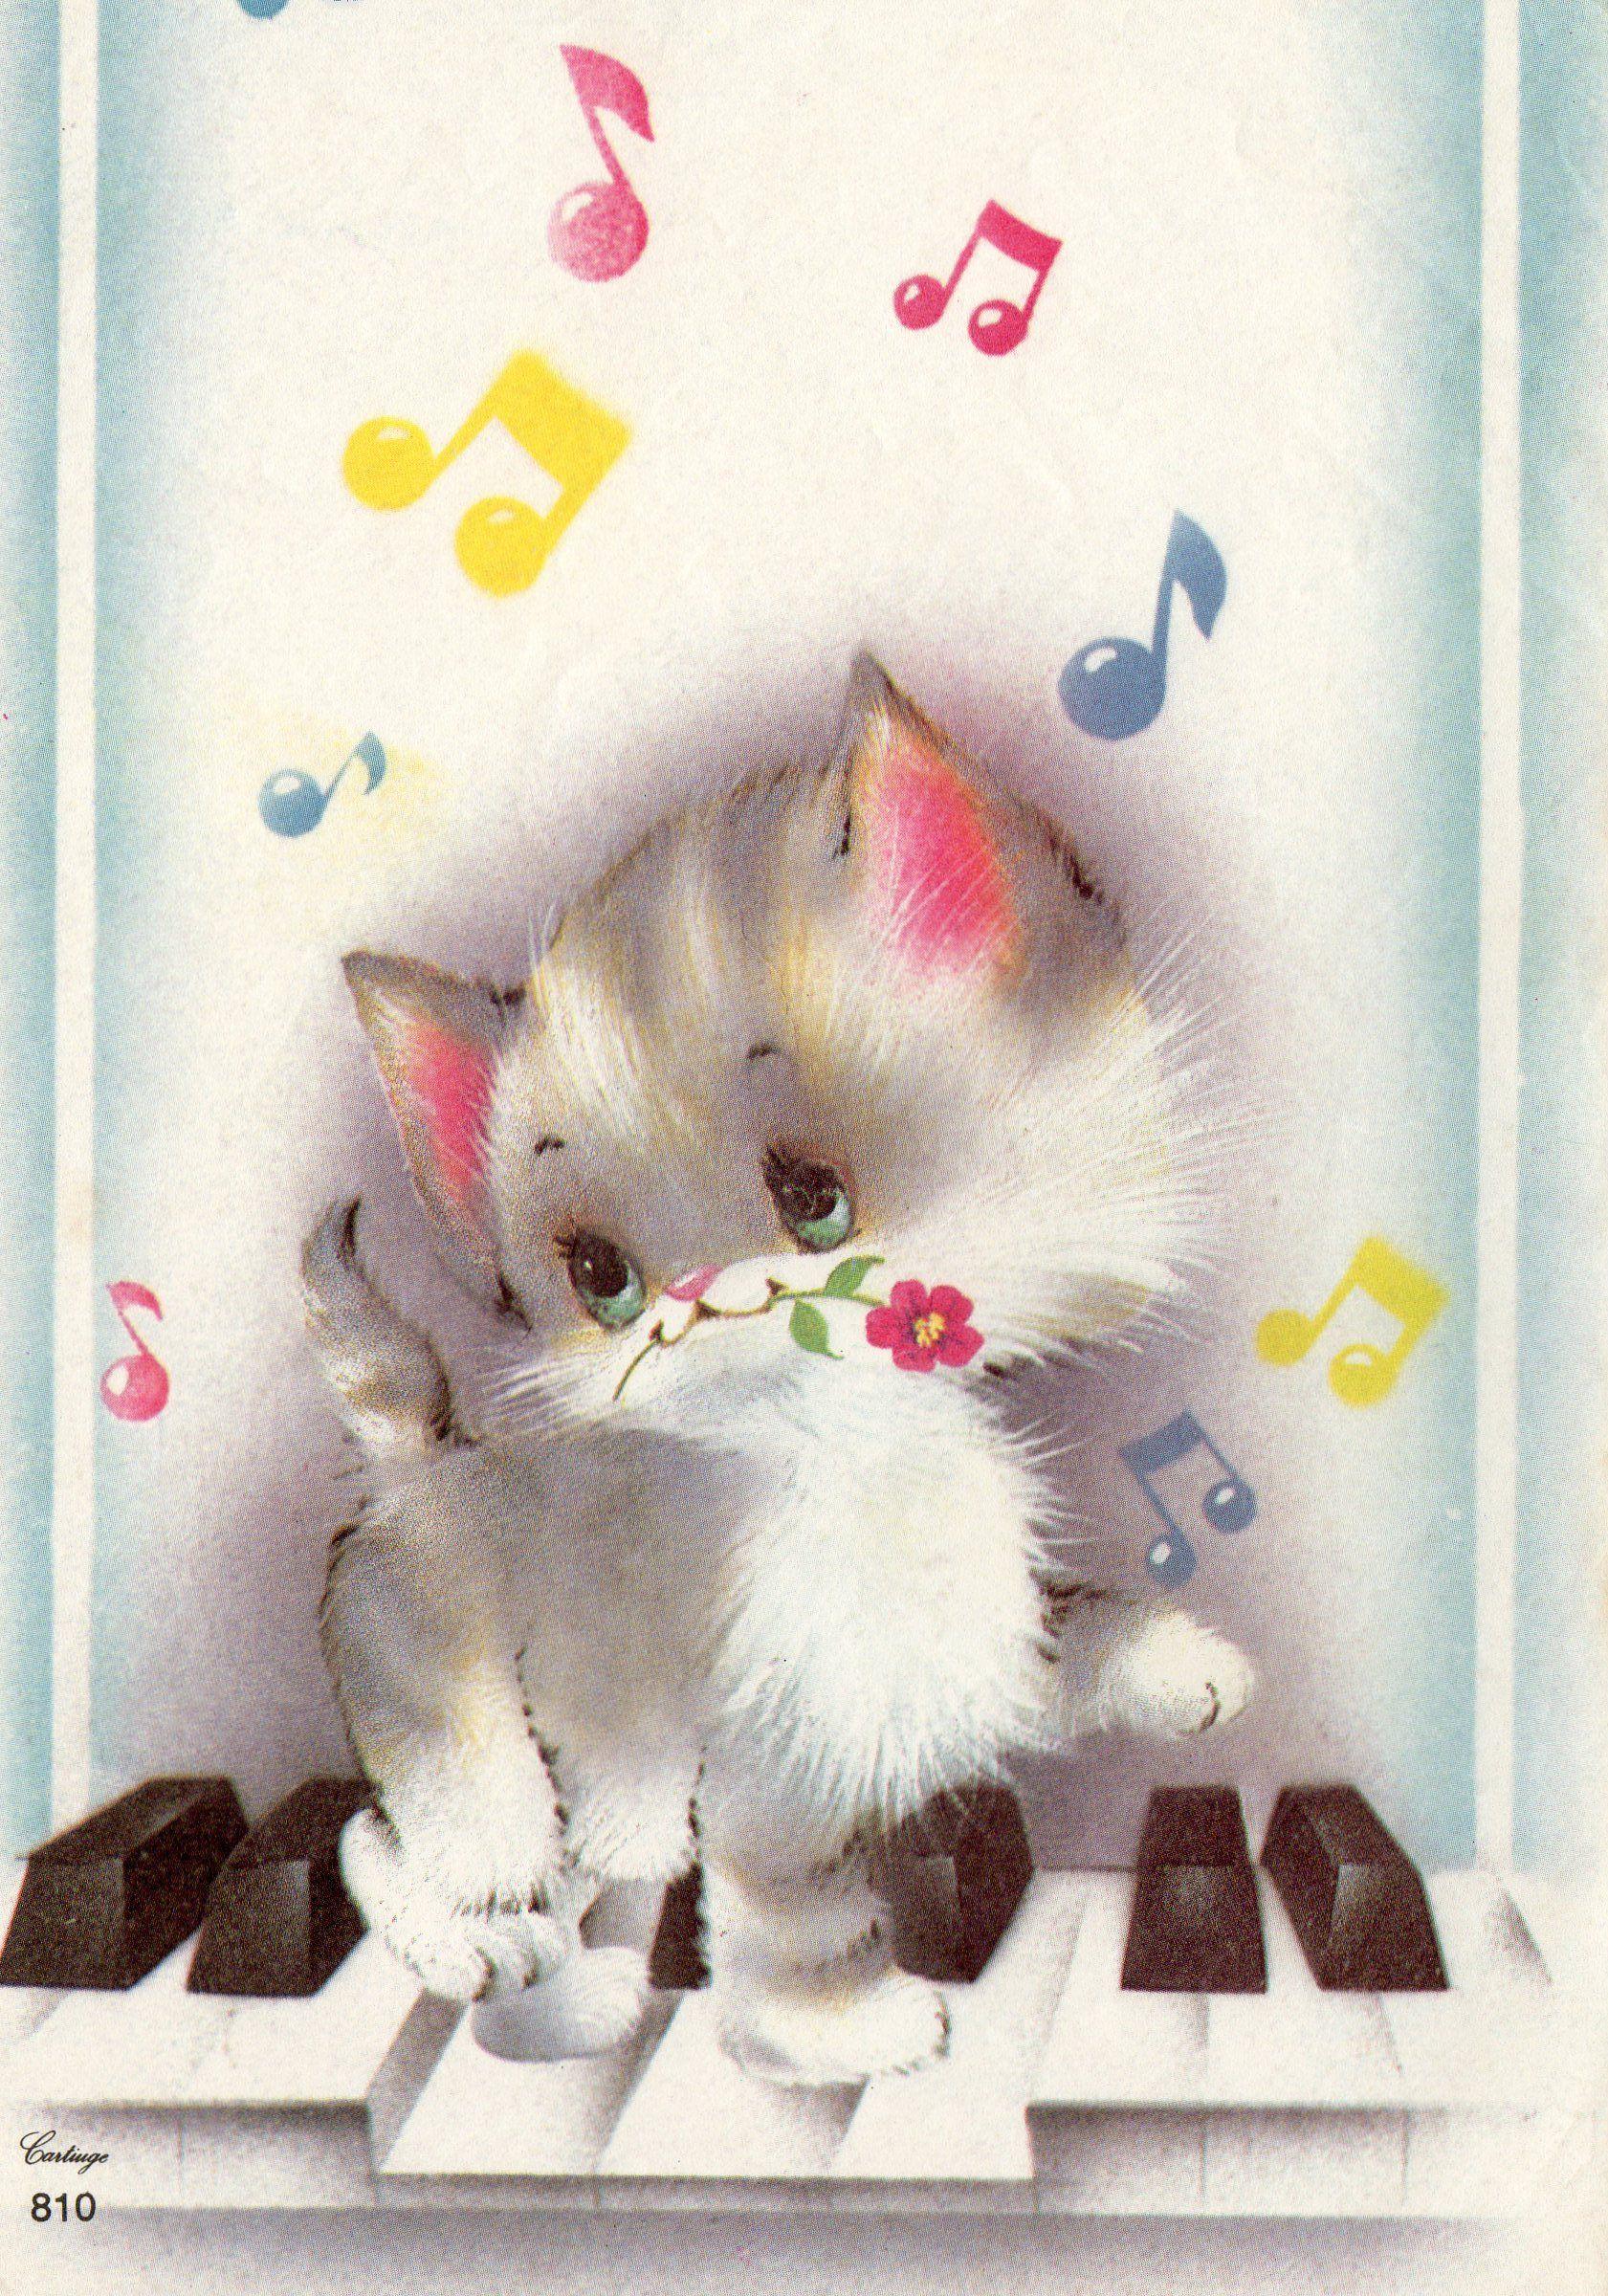 Papeldecarta Papel De Carta Vintage Cartiuge 810 Kittens Vintage Cartoon Clip Art Kitten Images